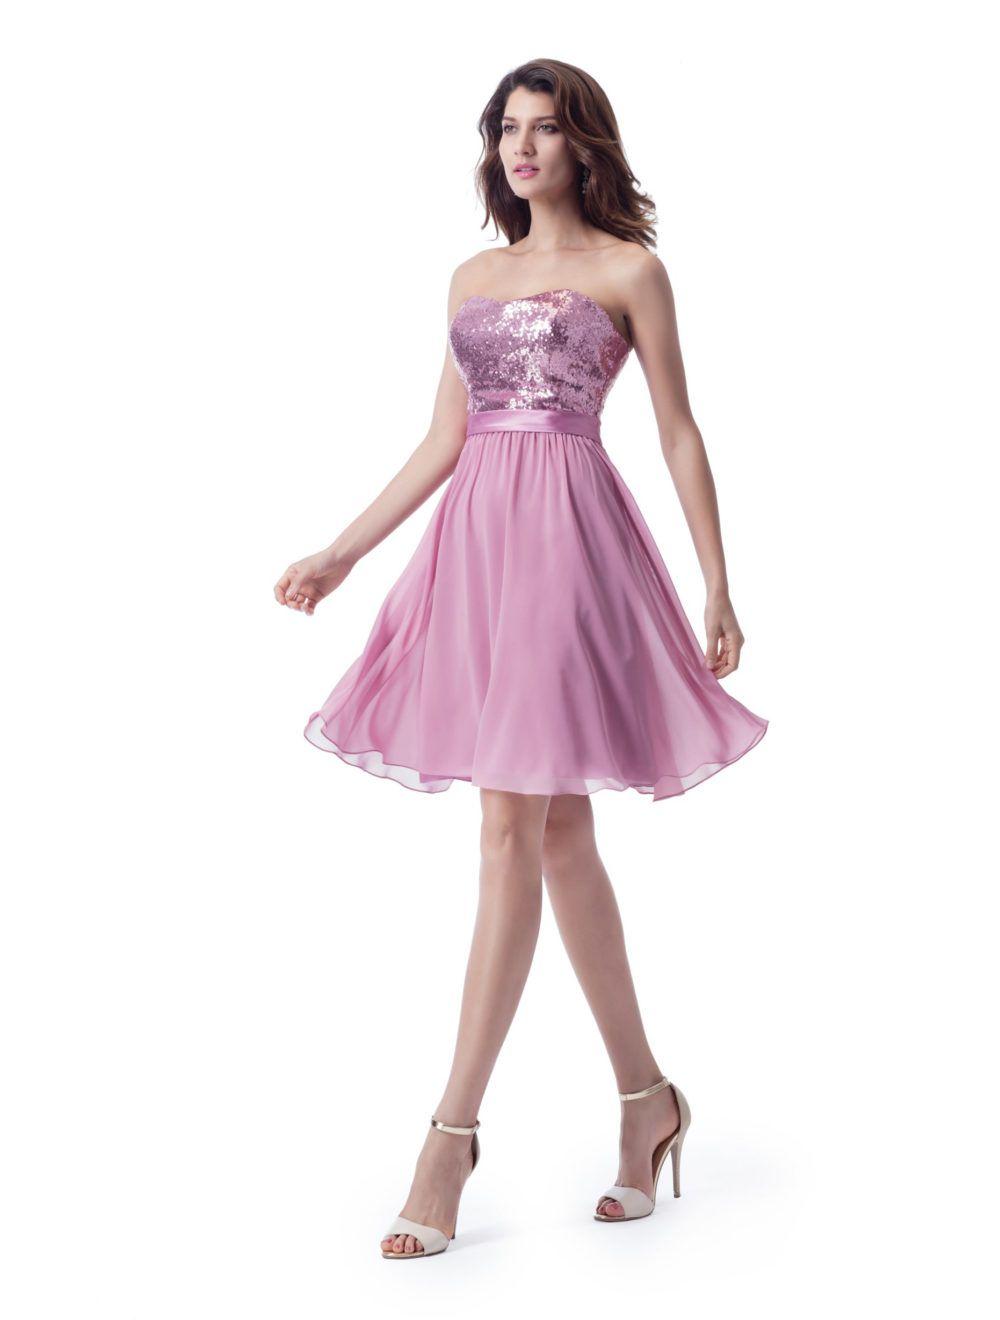 BM2261 | Venus Bridal Bridesmaids | Pinterest